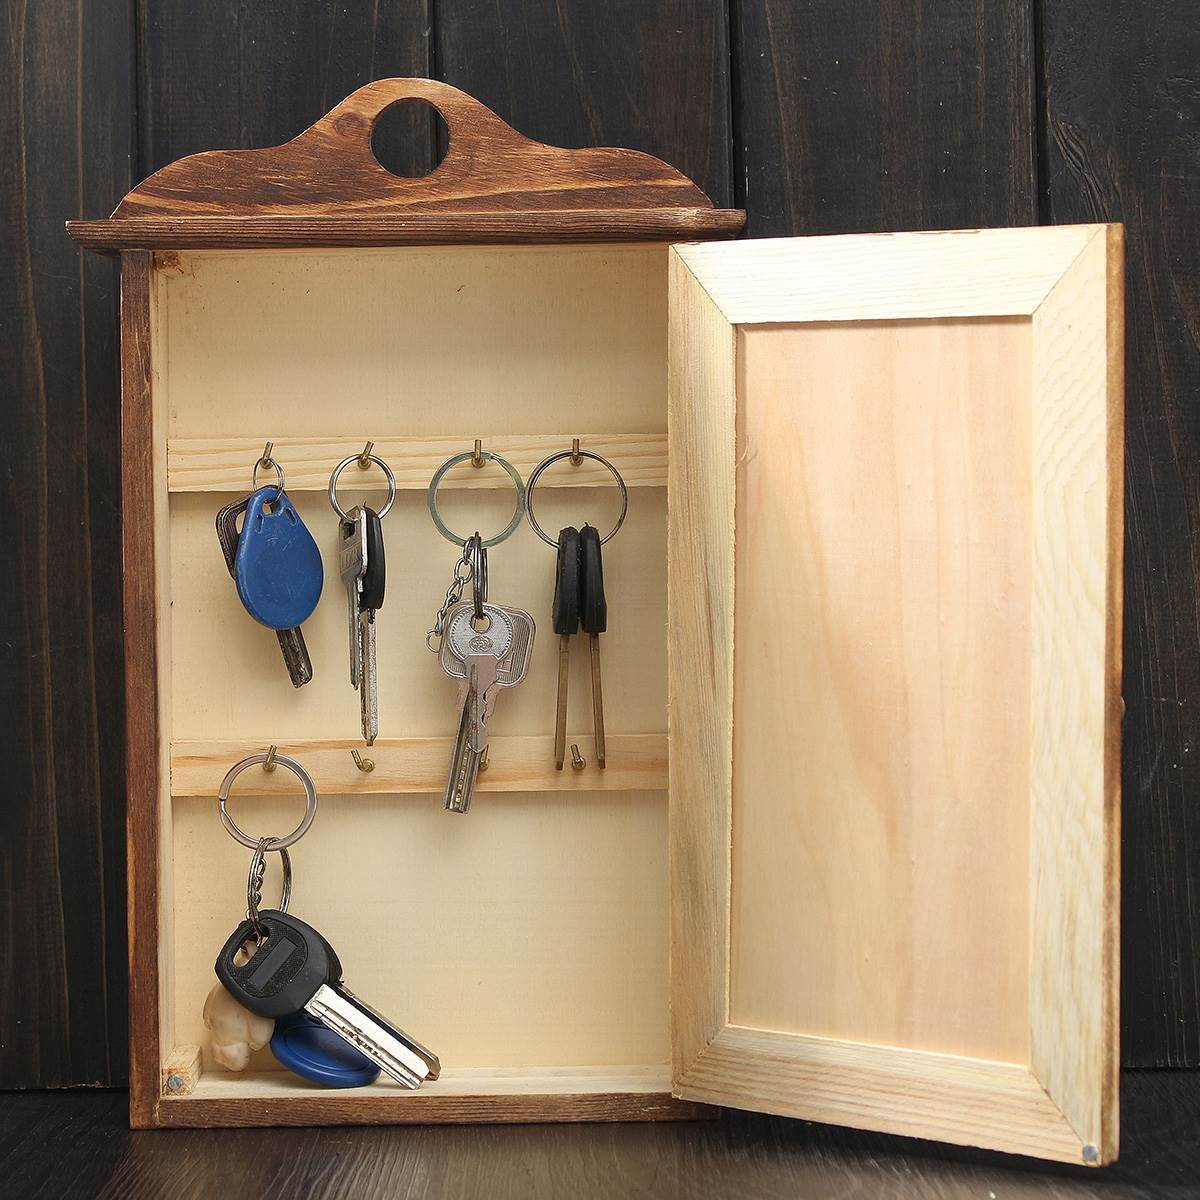 European Retro Keys Storage With Door Wall Hanging Wooden Box ...